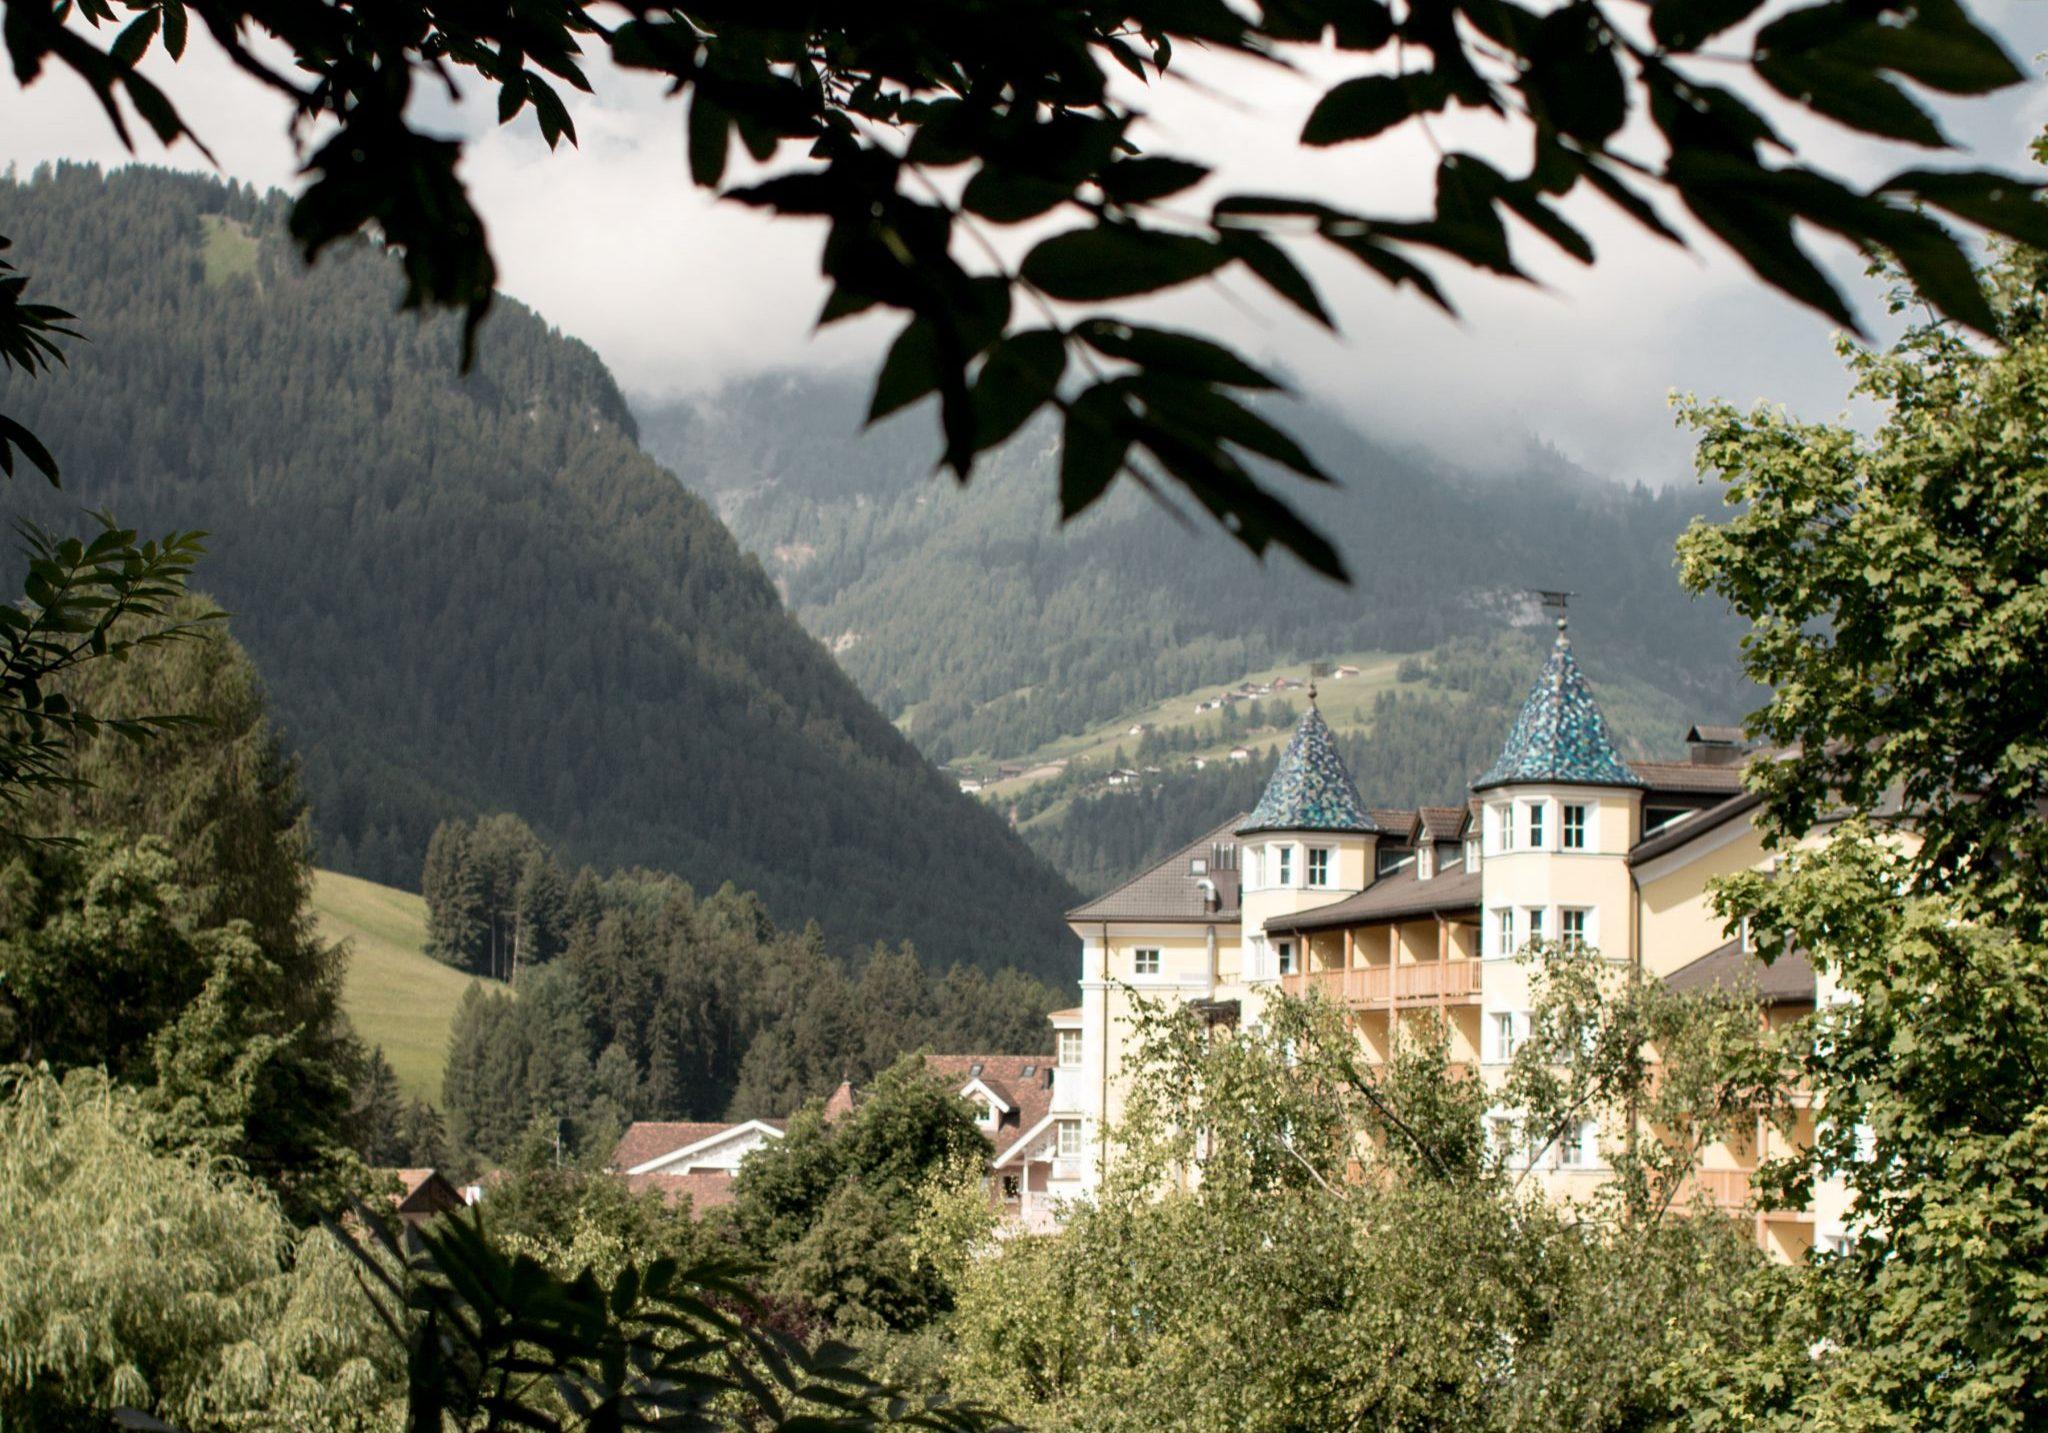 Adler Dolomites Ortisei Italy Hotel Review Sunny Exterior Hotel